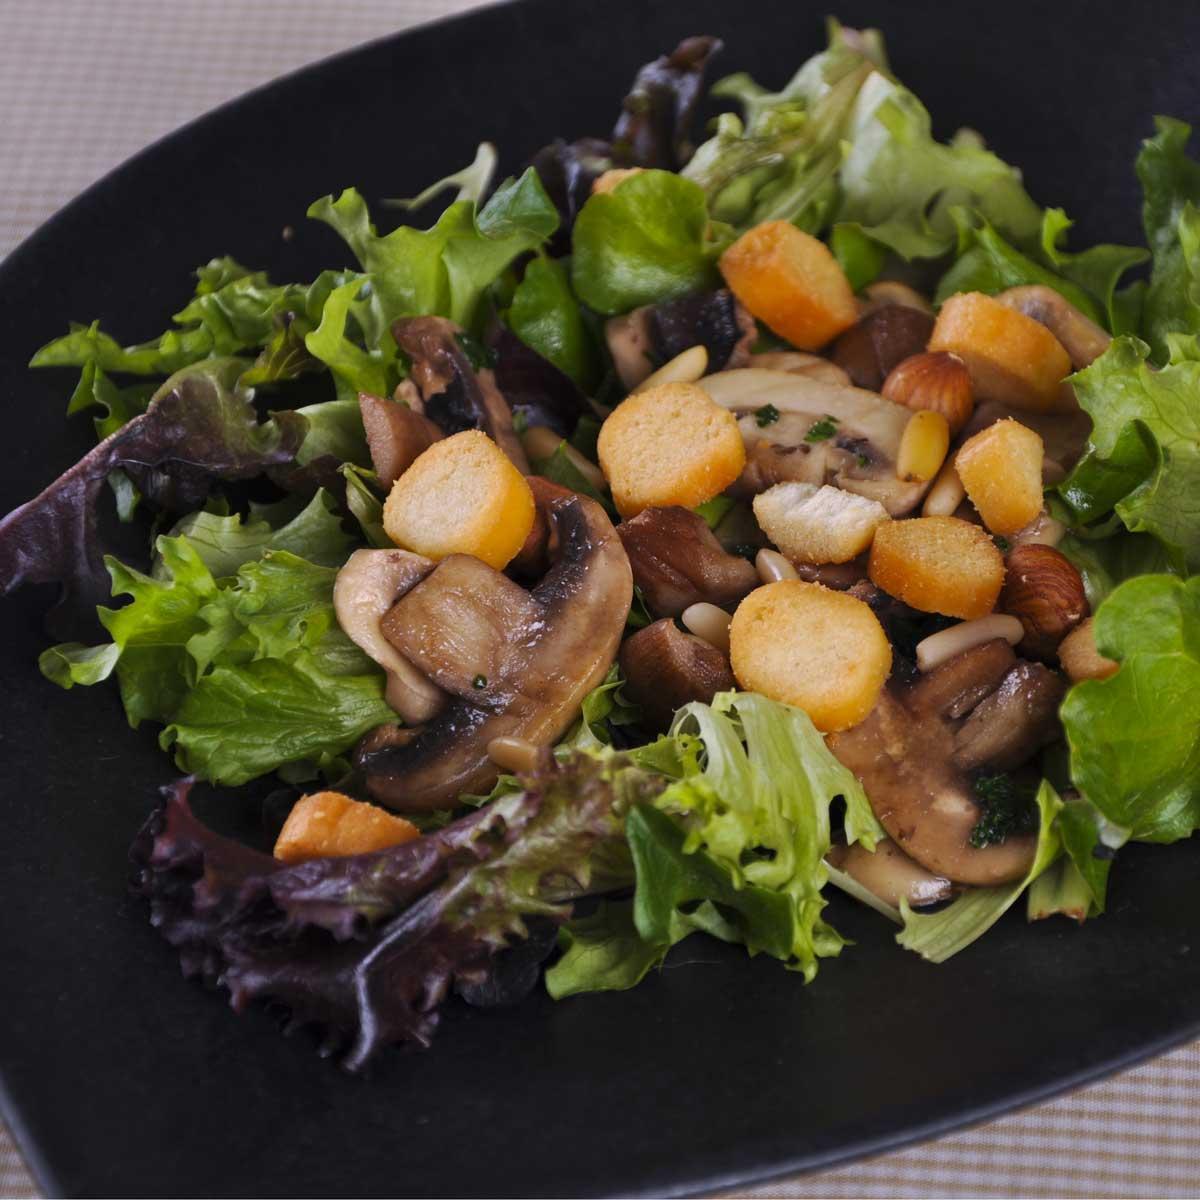 recette salade craquante aux deux champignons cuisine madame figaro. Black Bedroom Furniture Sets. Home Design Ideas